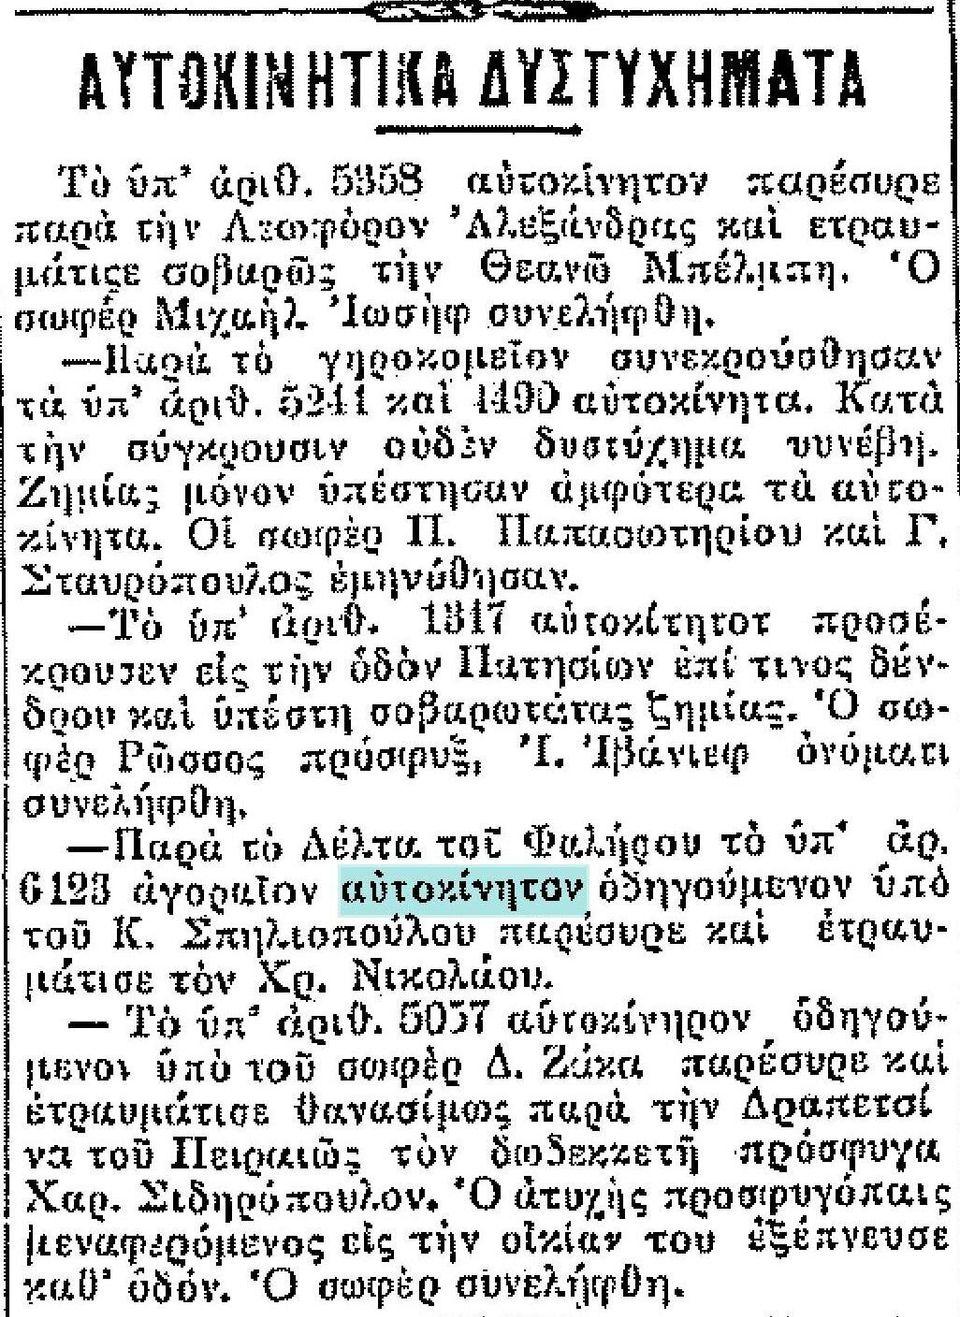 28.6.1924